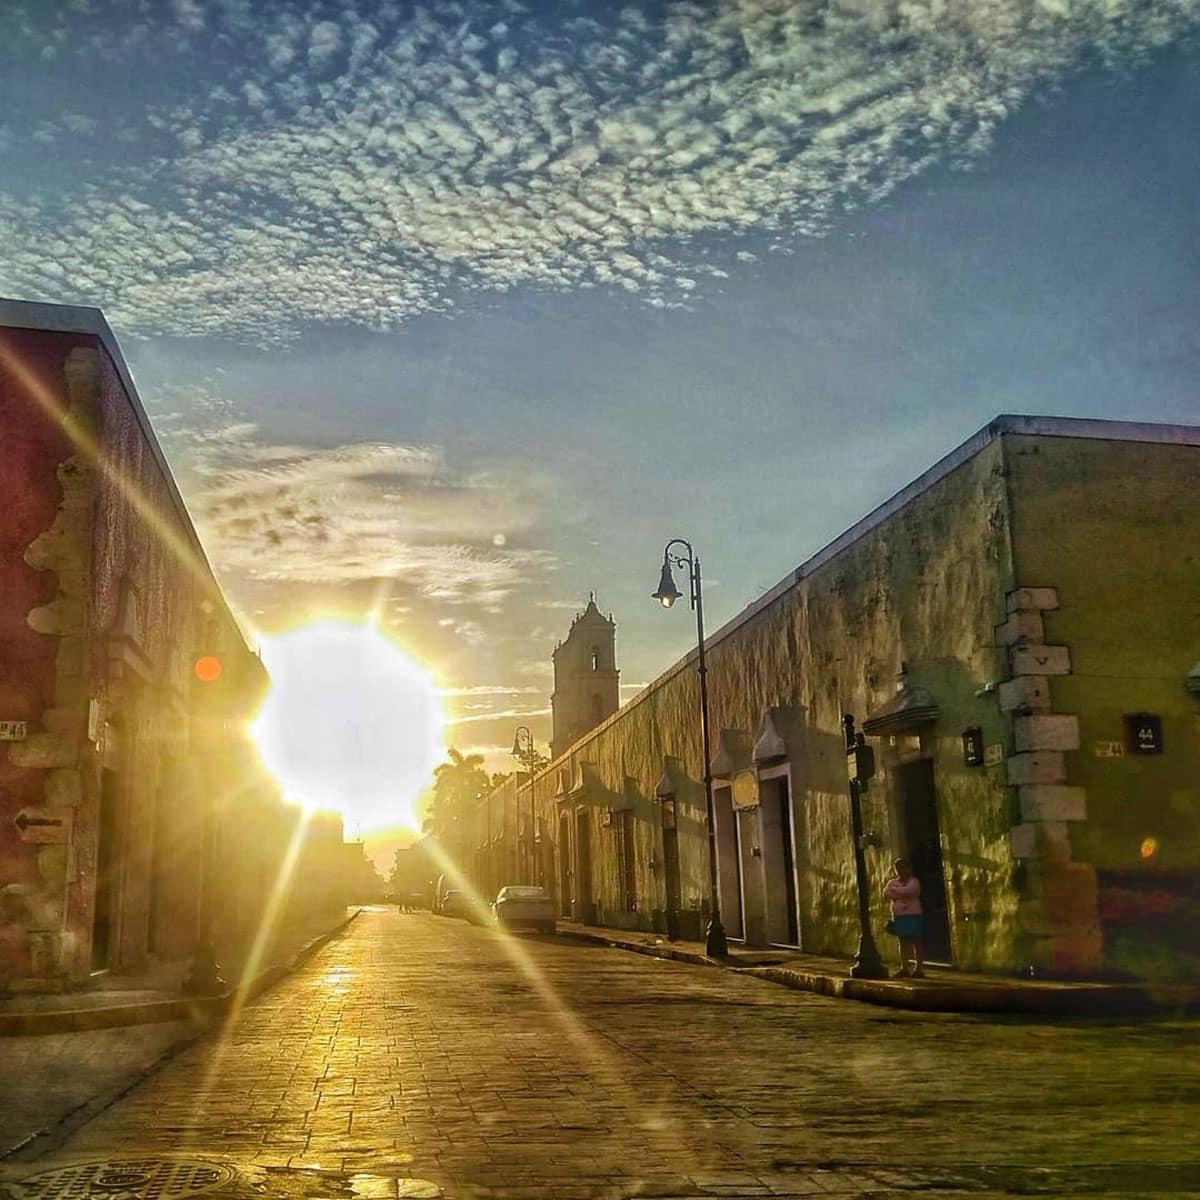 Los Frailes street